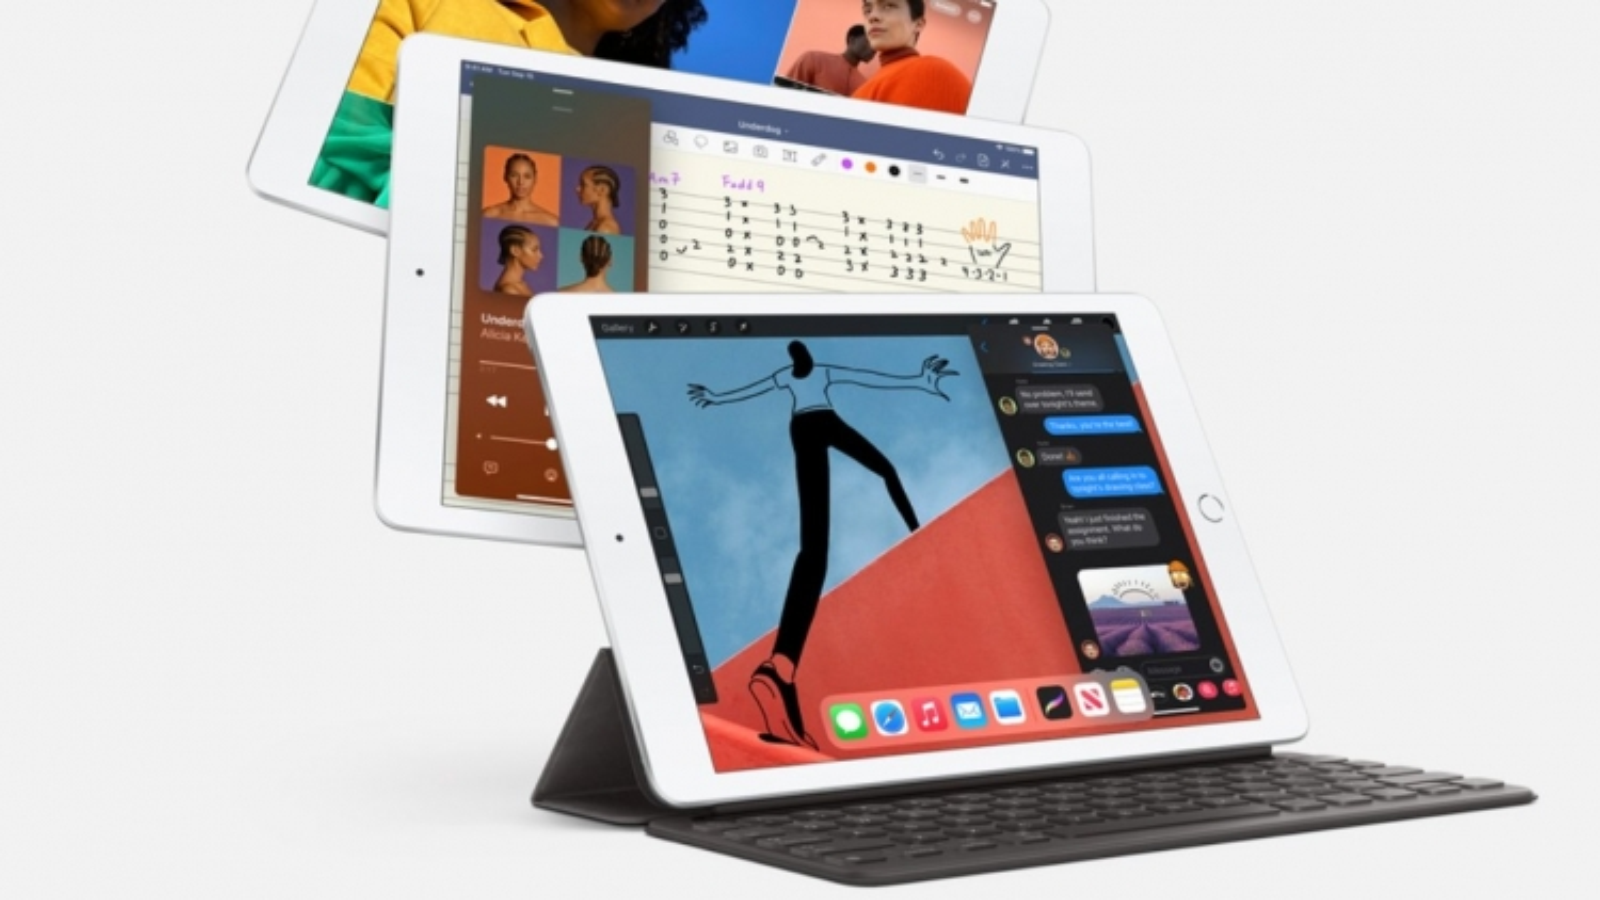 iPad mỏng hơn, iPad mini ra mắt cuối năm nay